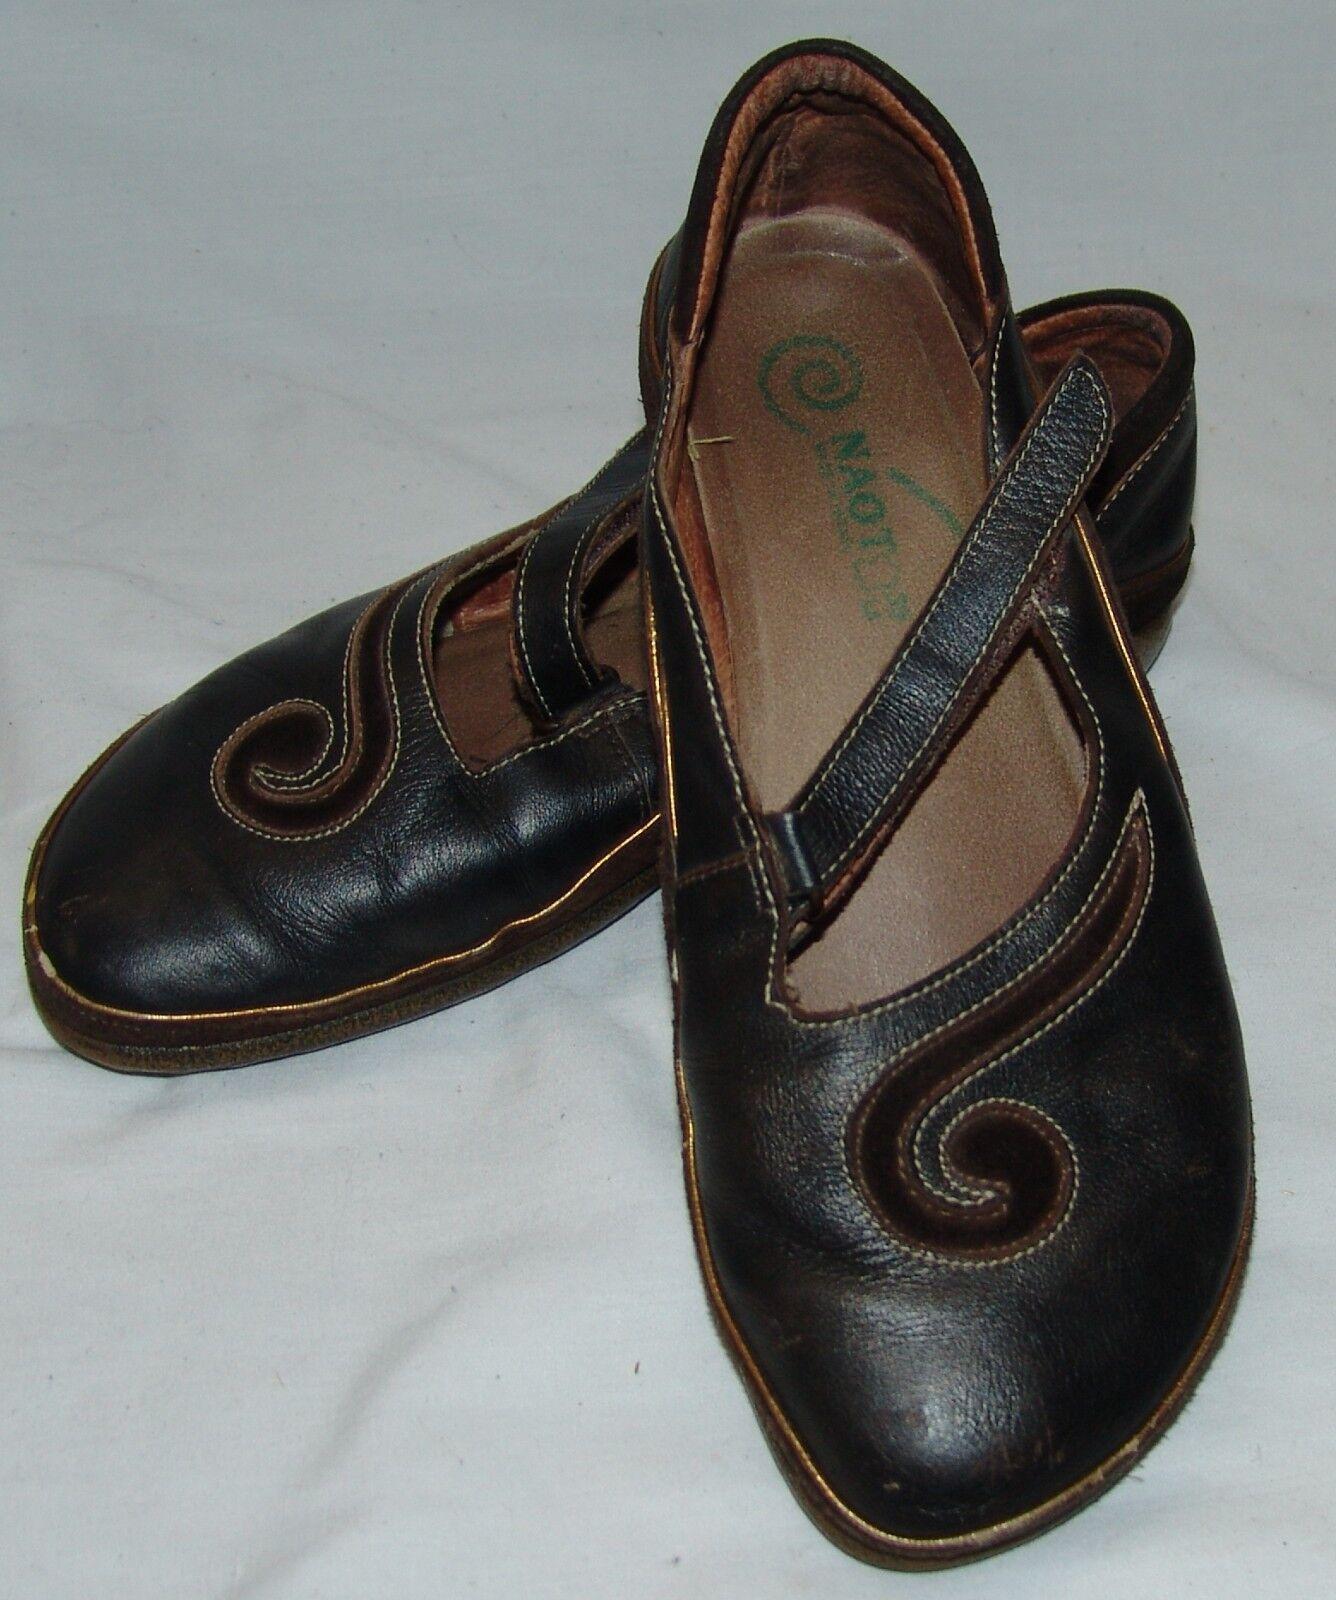 Naot Damenschuhe Braun Schuhes 39 8 Matai Mary Jane Swirl Flats